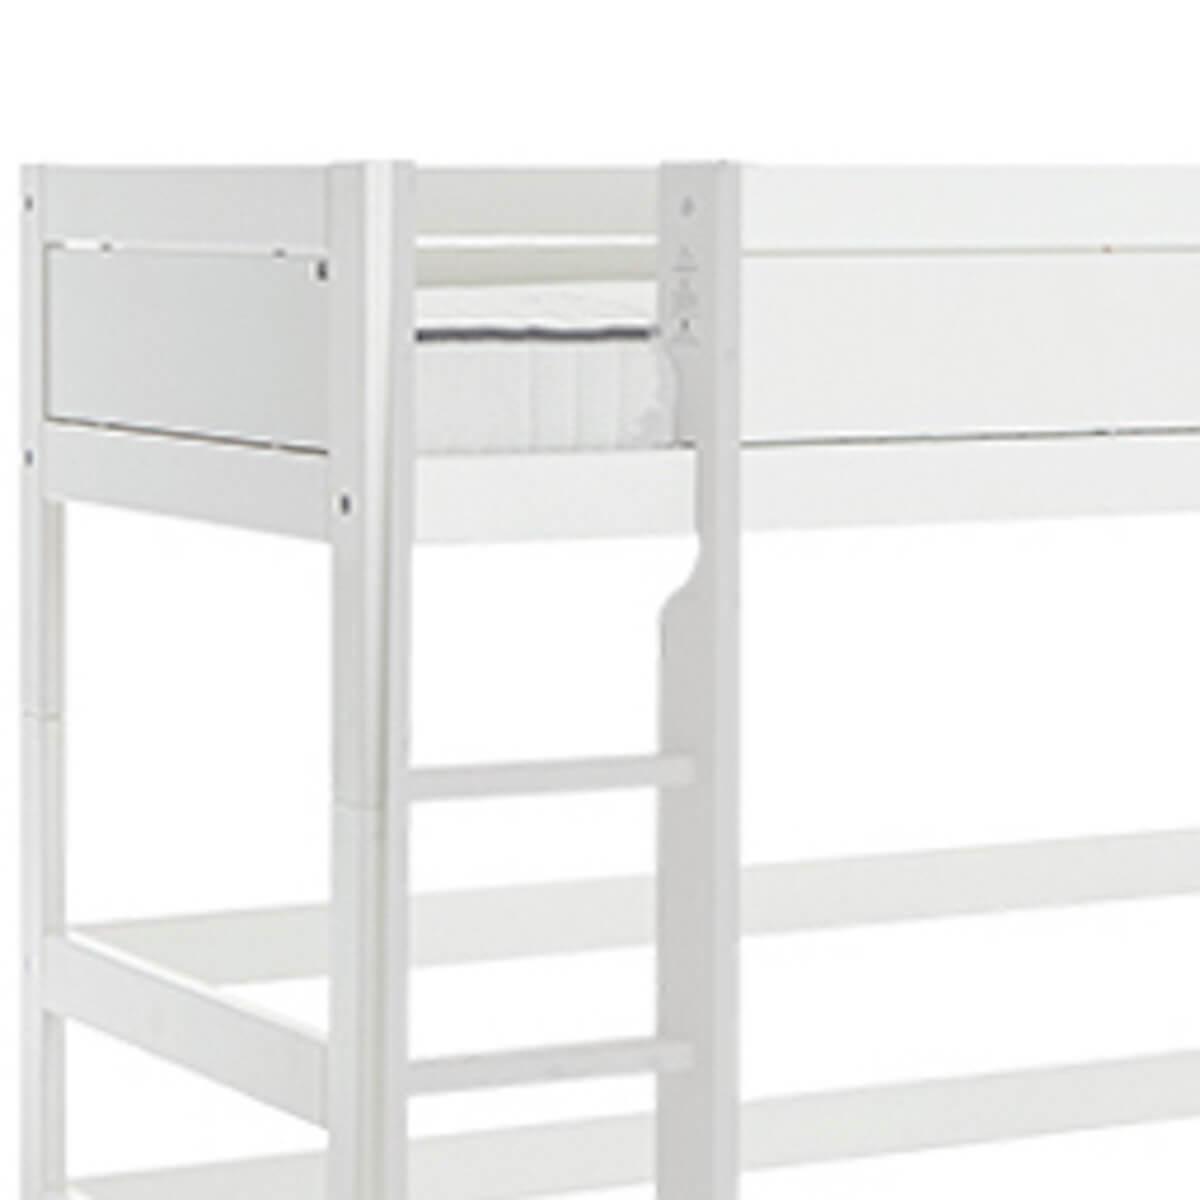 Cama semi alta 90x200cm escalera recta Lifetime blanco